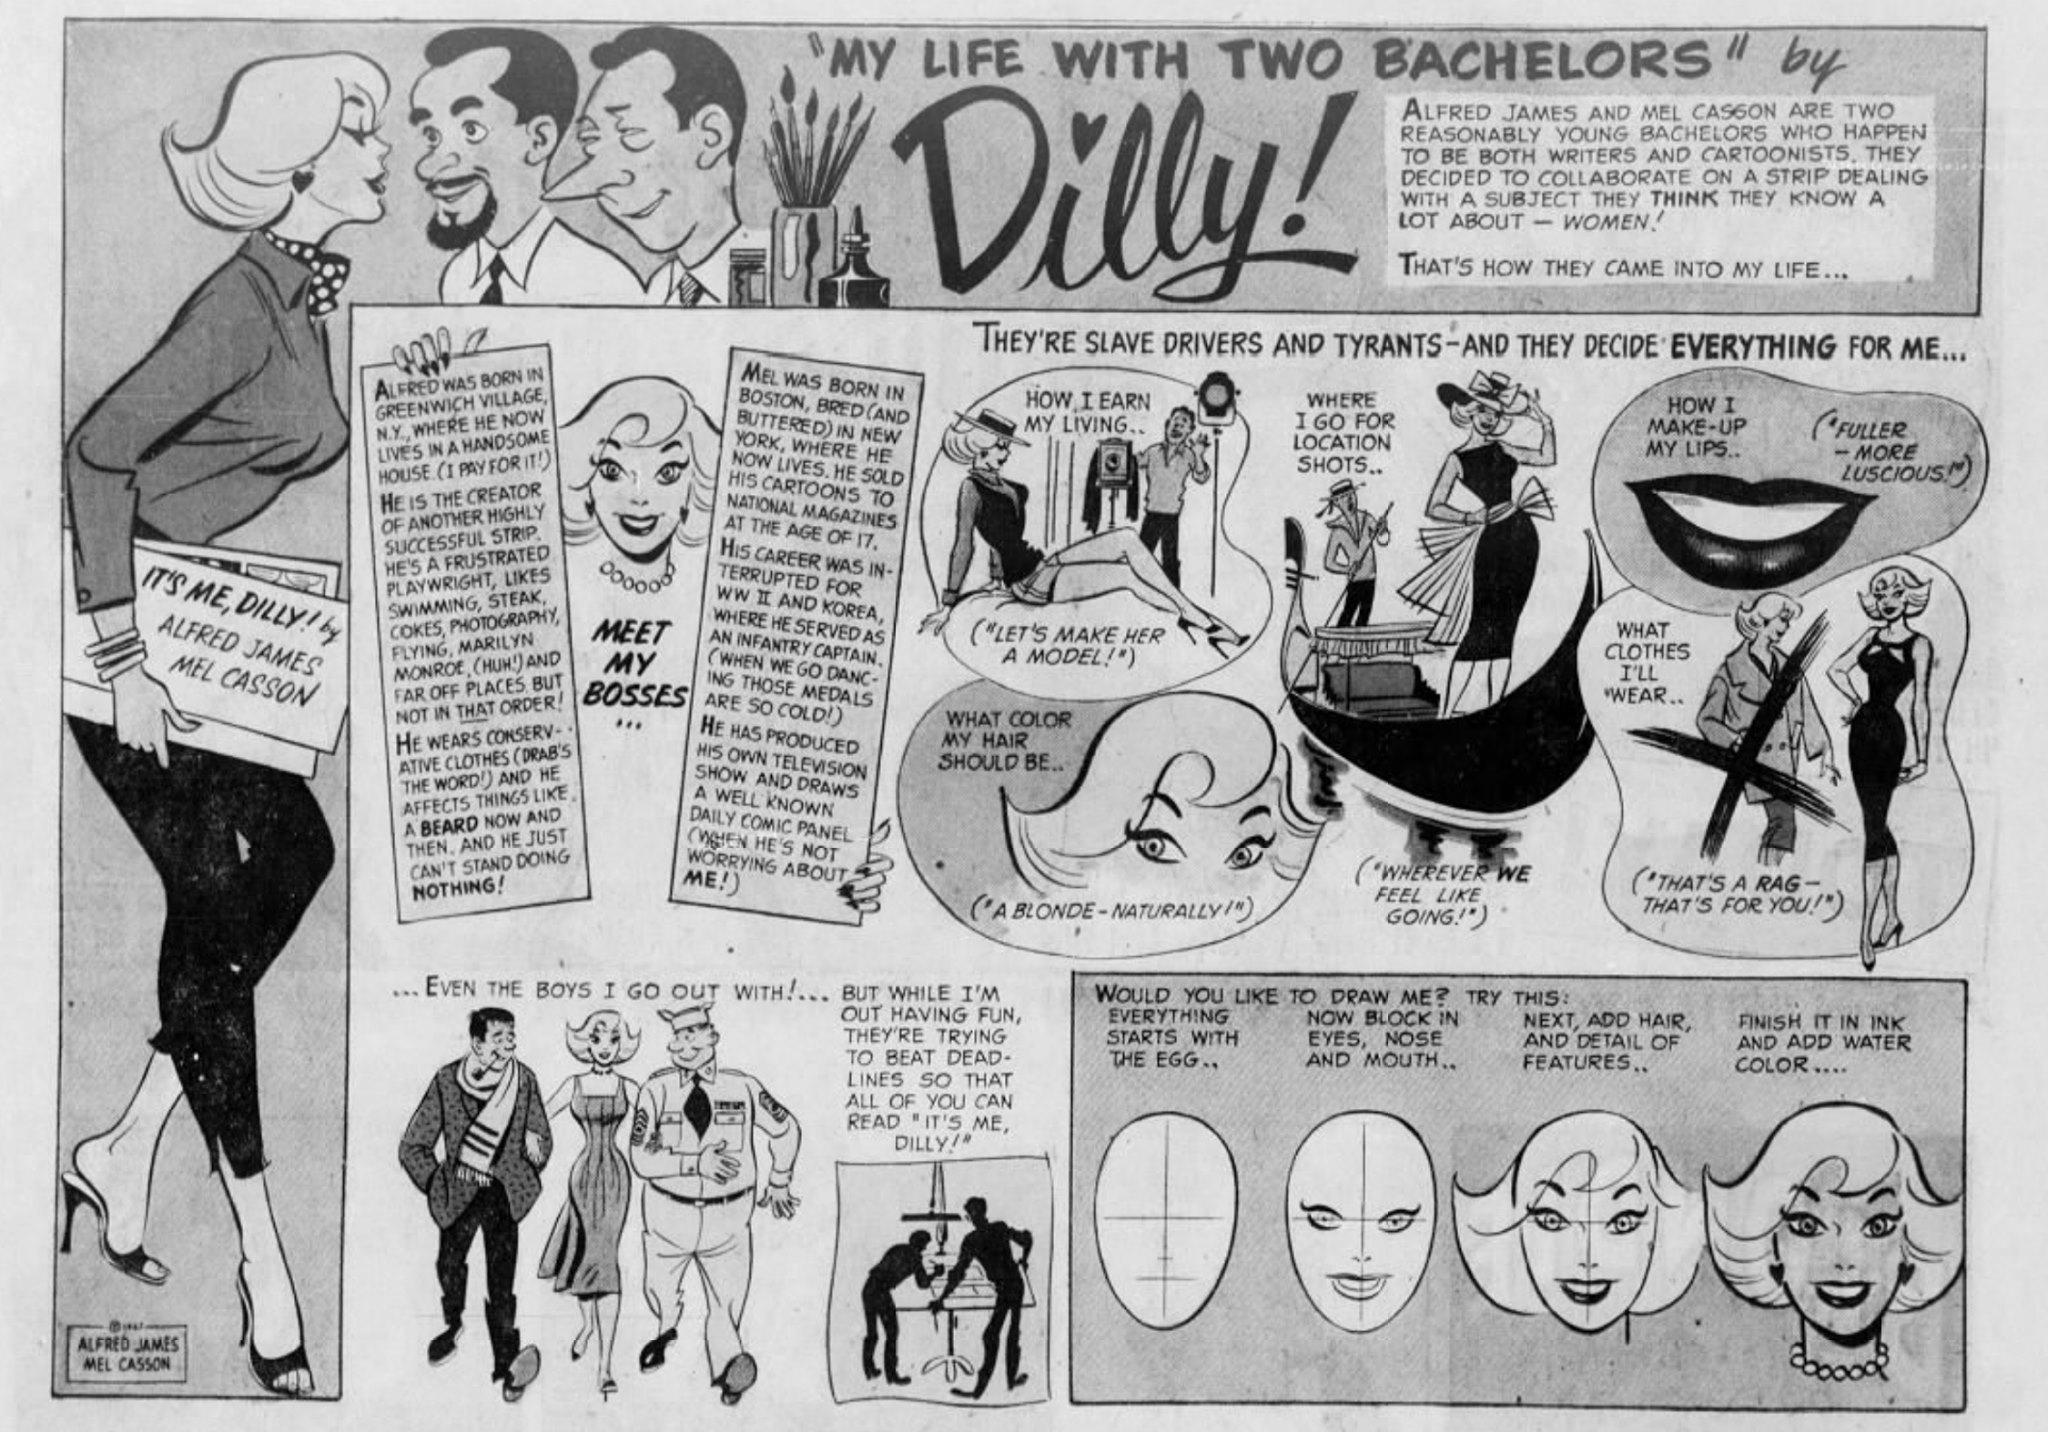 1957 Newspaper Comics and Creators Self-Profiles The Daily